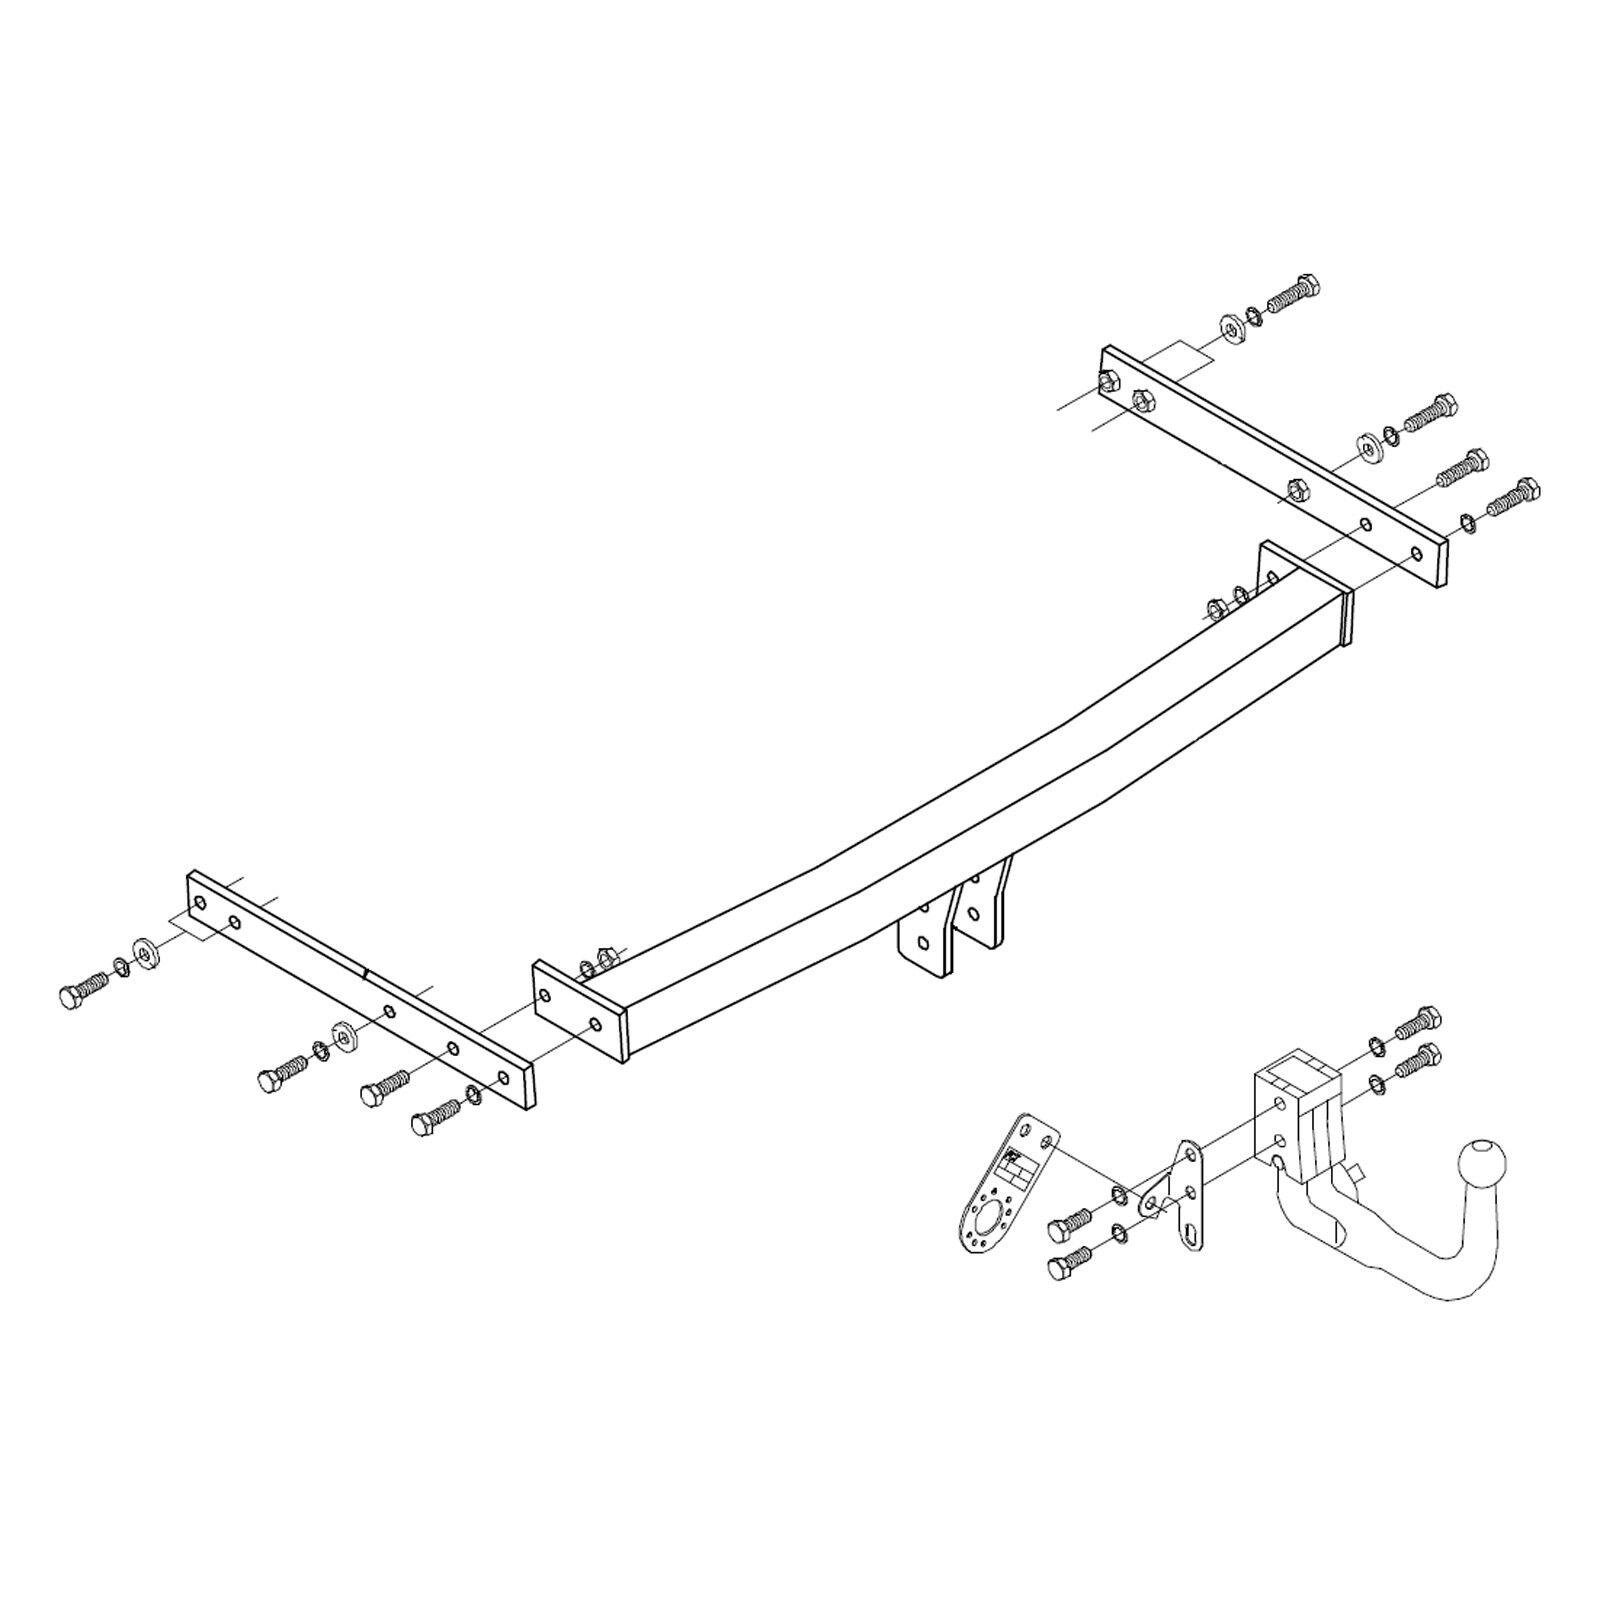 details about towbar for skoda octavia estate 2005 2013 detachable swan neck tow bar [ 1600 x 1600 Pixel ]